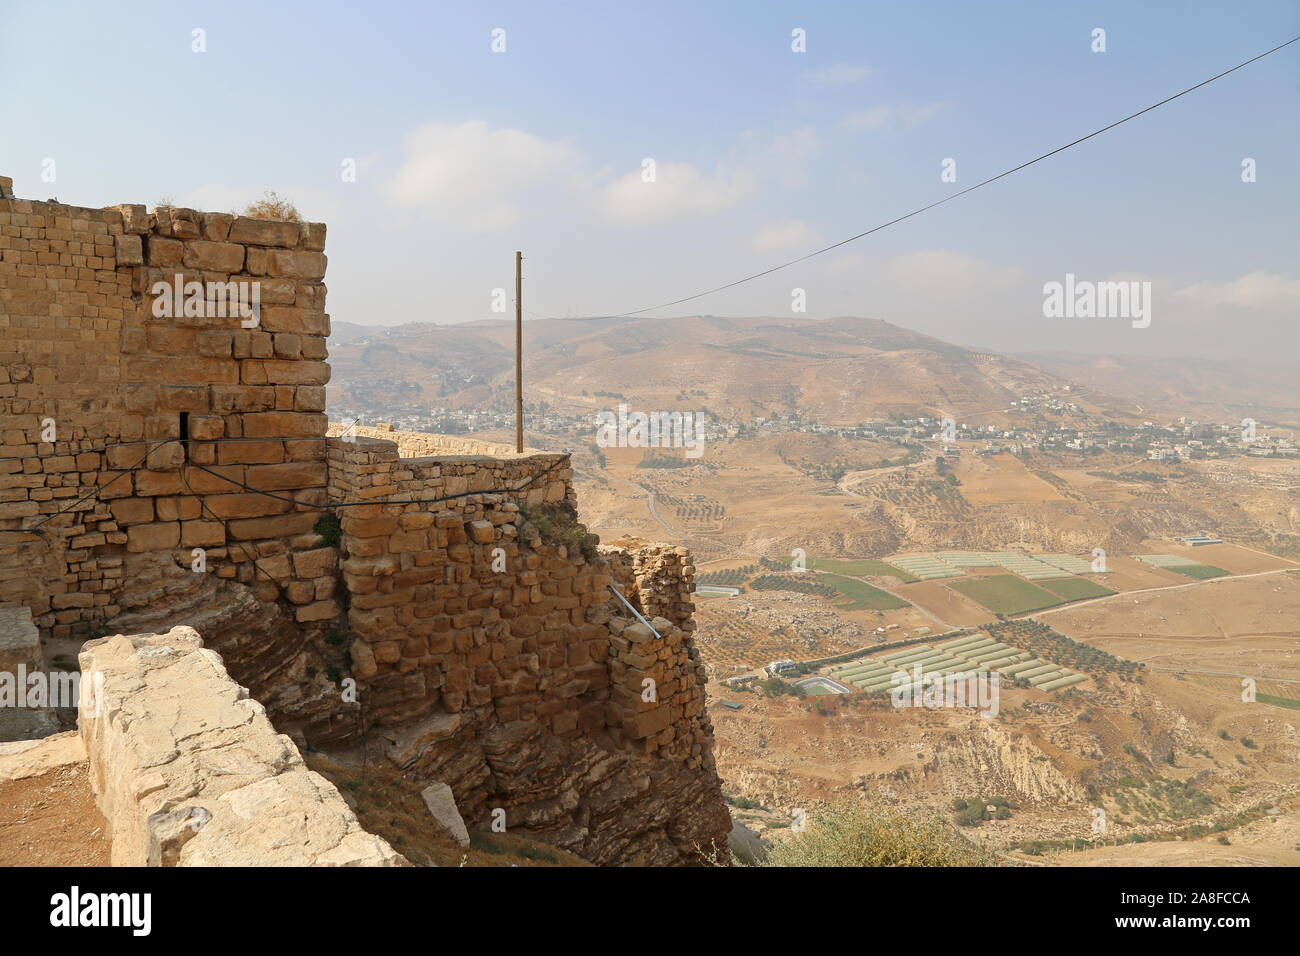 Valley below Karak Castle, Al Karak, Karak Governorate, Jordan, Middle East Stock Photo